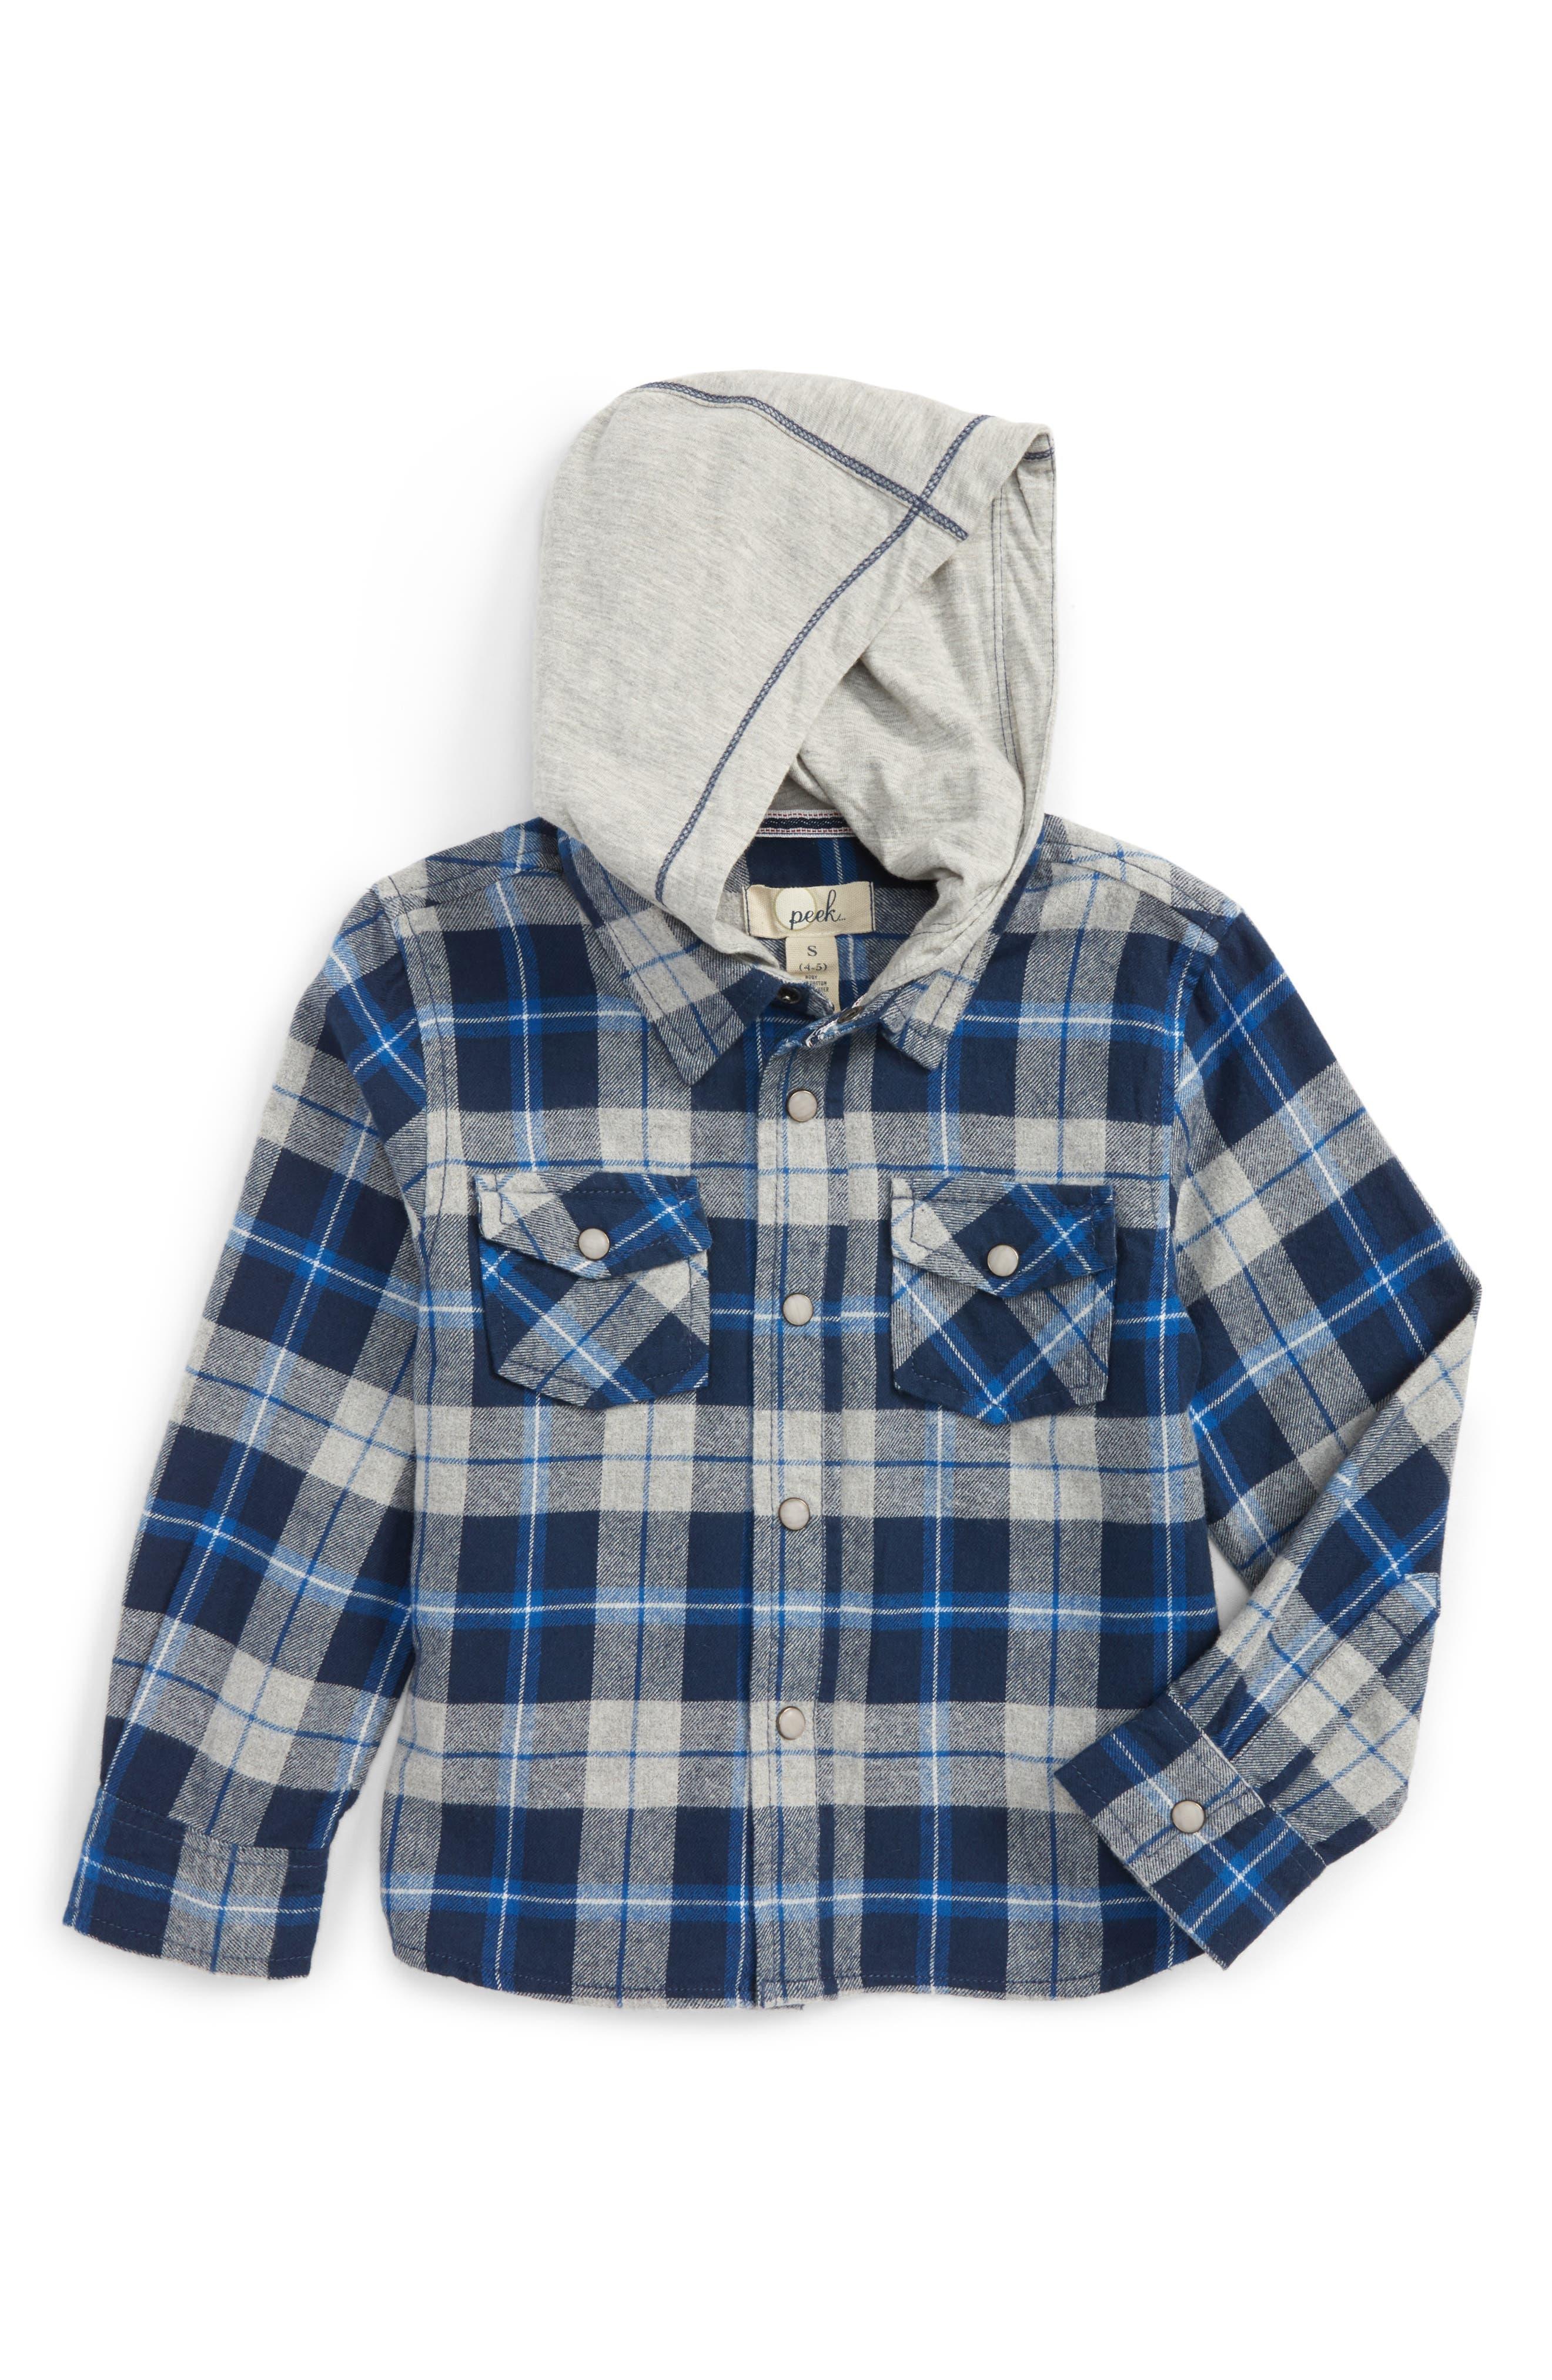 Main Image - Peek Liam Hooded Flannel Shirt (Toddler Boys, Little Boys & Big Boys)